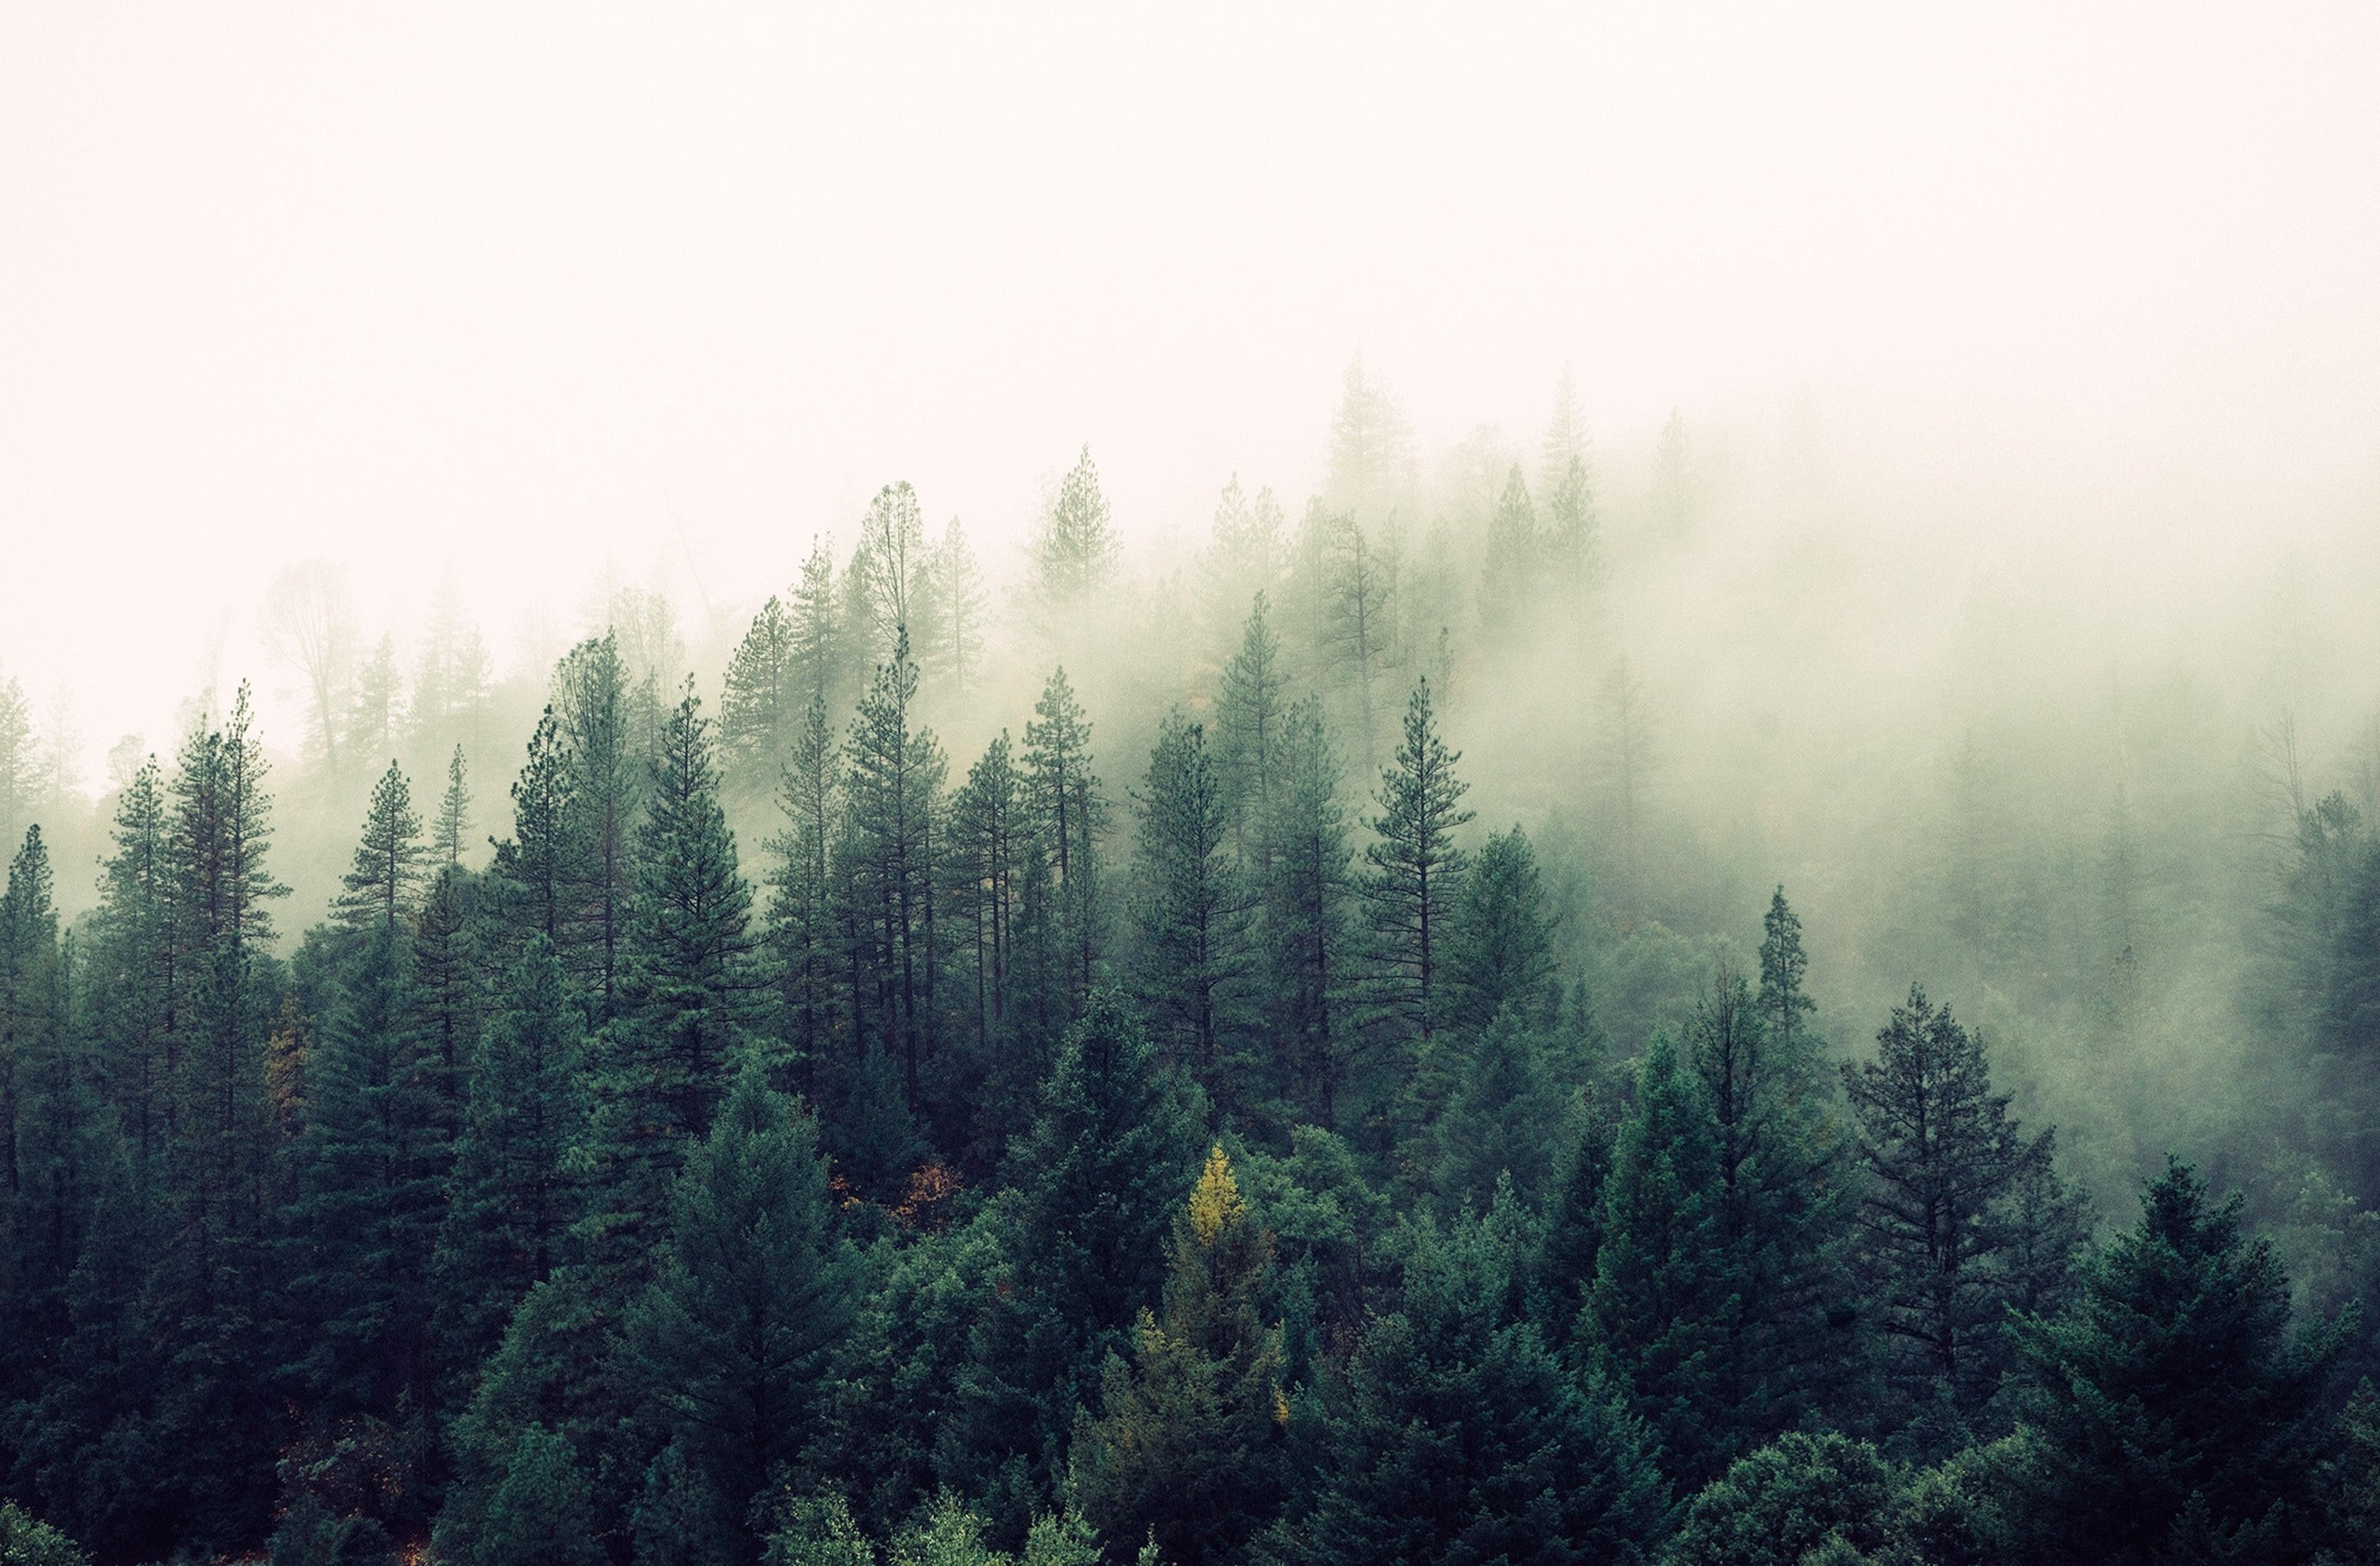 Copertina frasi sulla nebbia